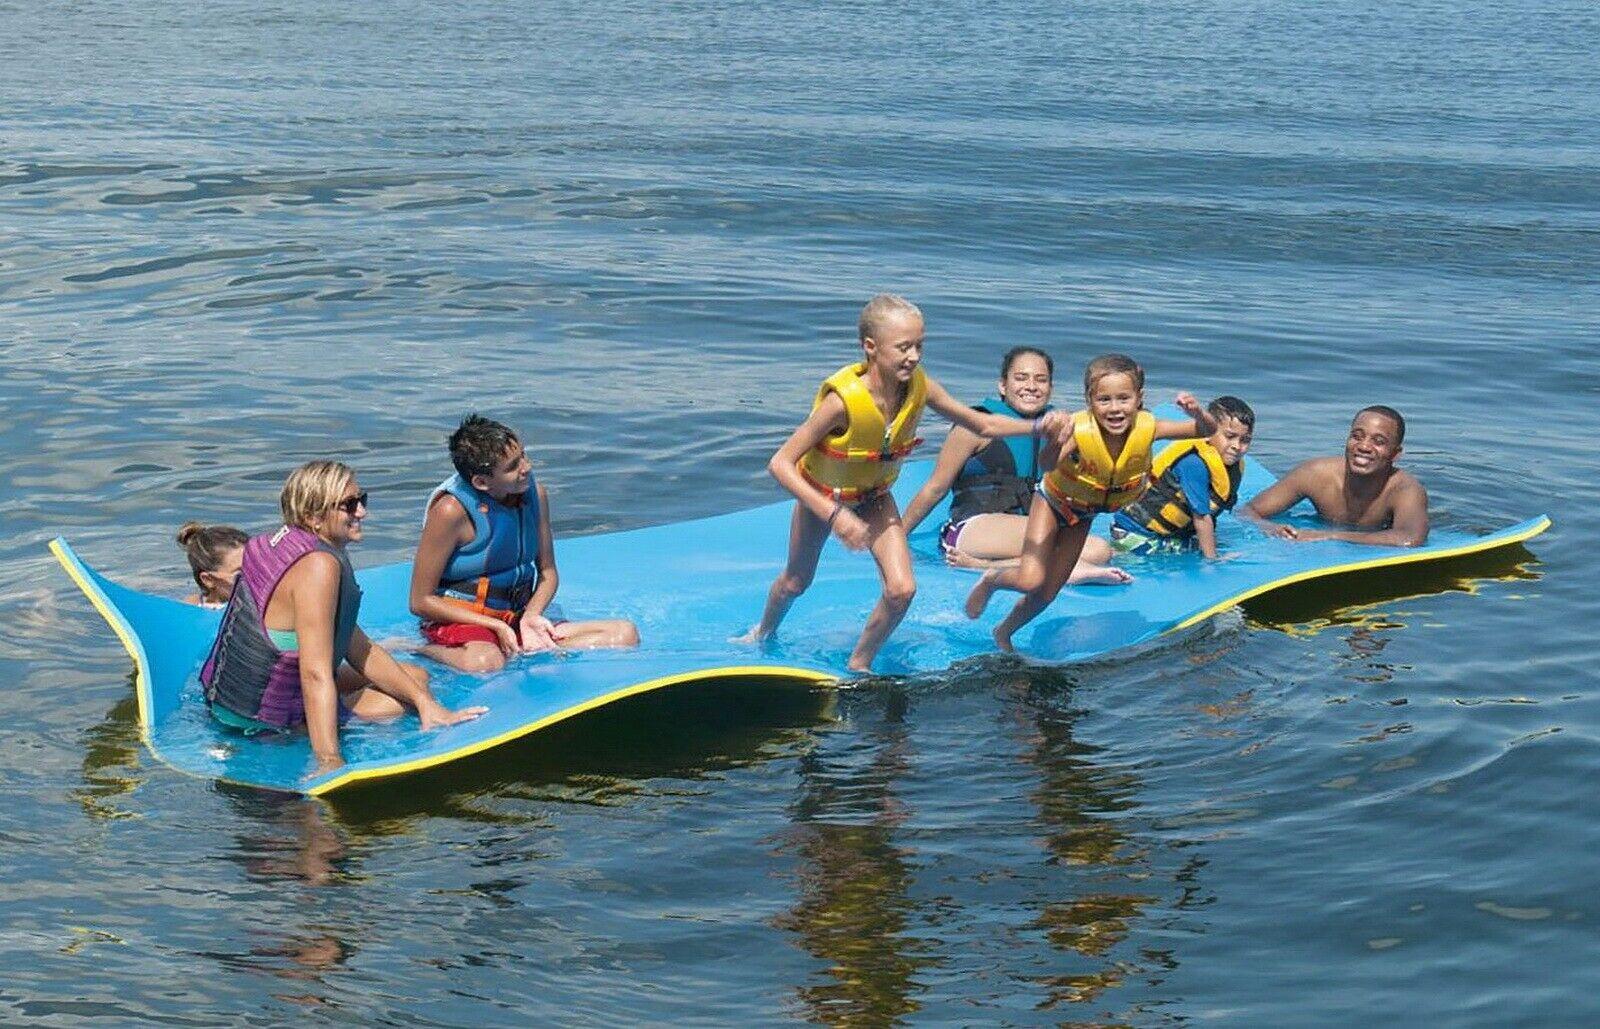 Image 2 - Huge 7 Person Floating Oasis Foam Raft Lake Sea Water Pad Mat 15' x 6' 1,500 lbs